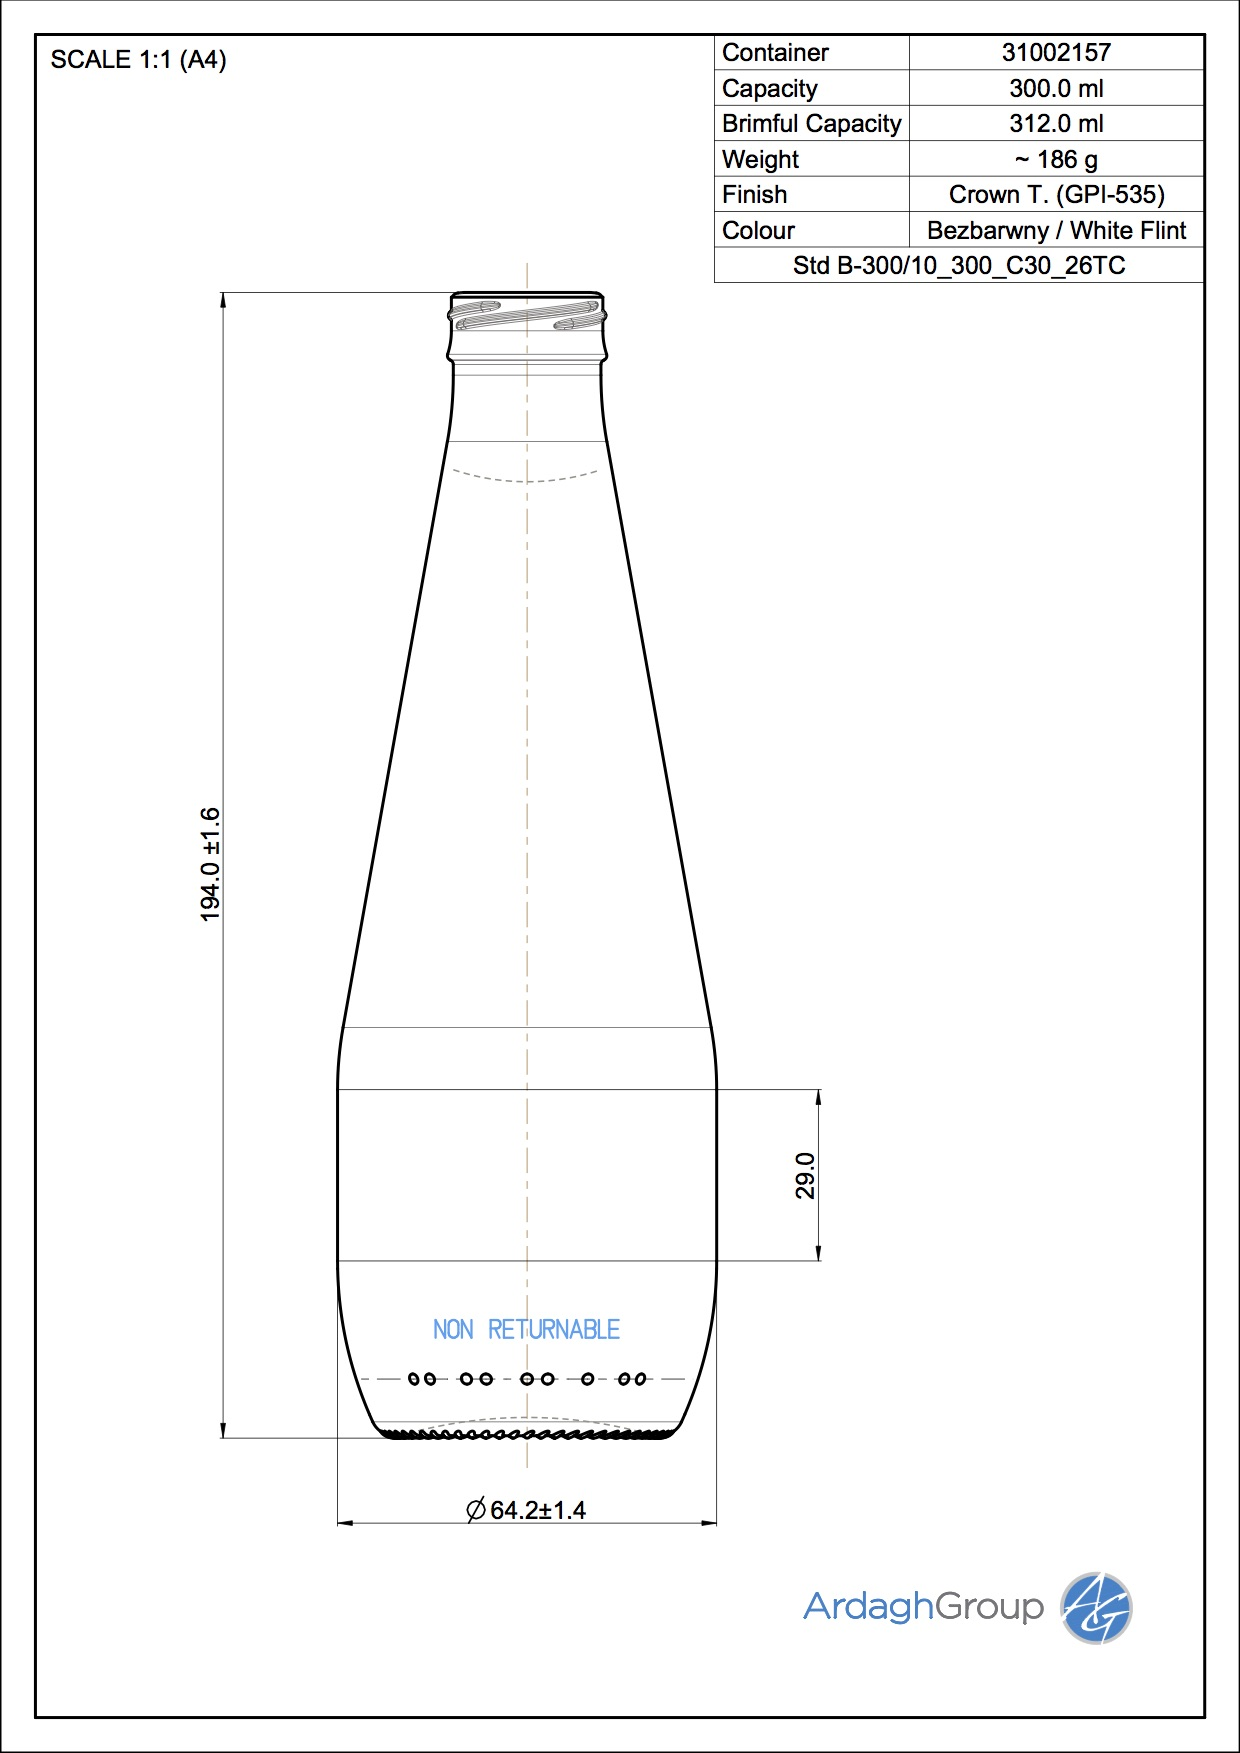 Std B-300/10(0) 300 C30 26TC